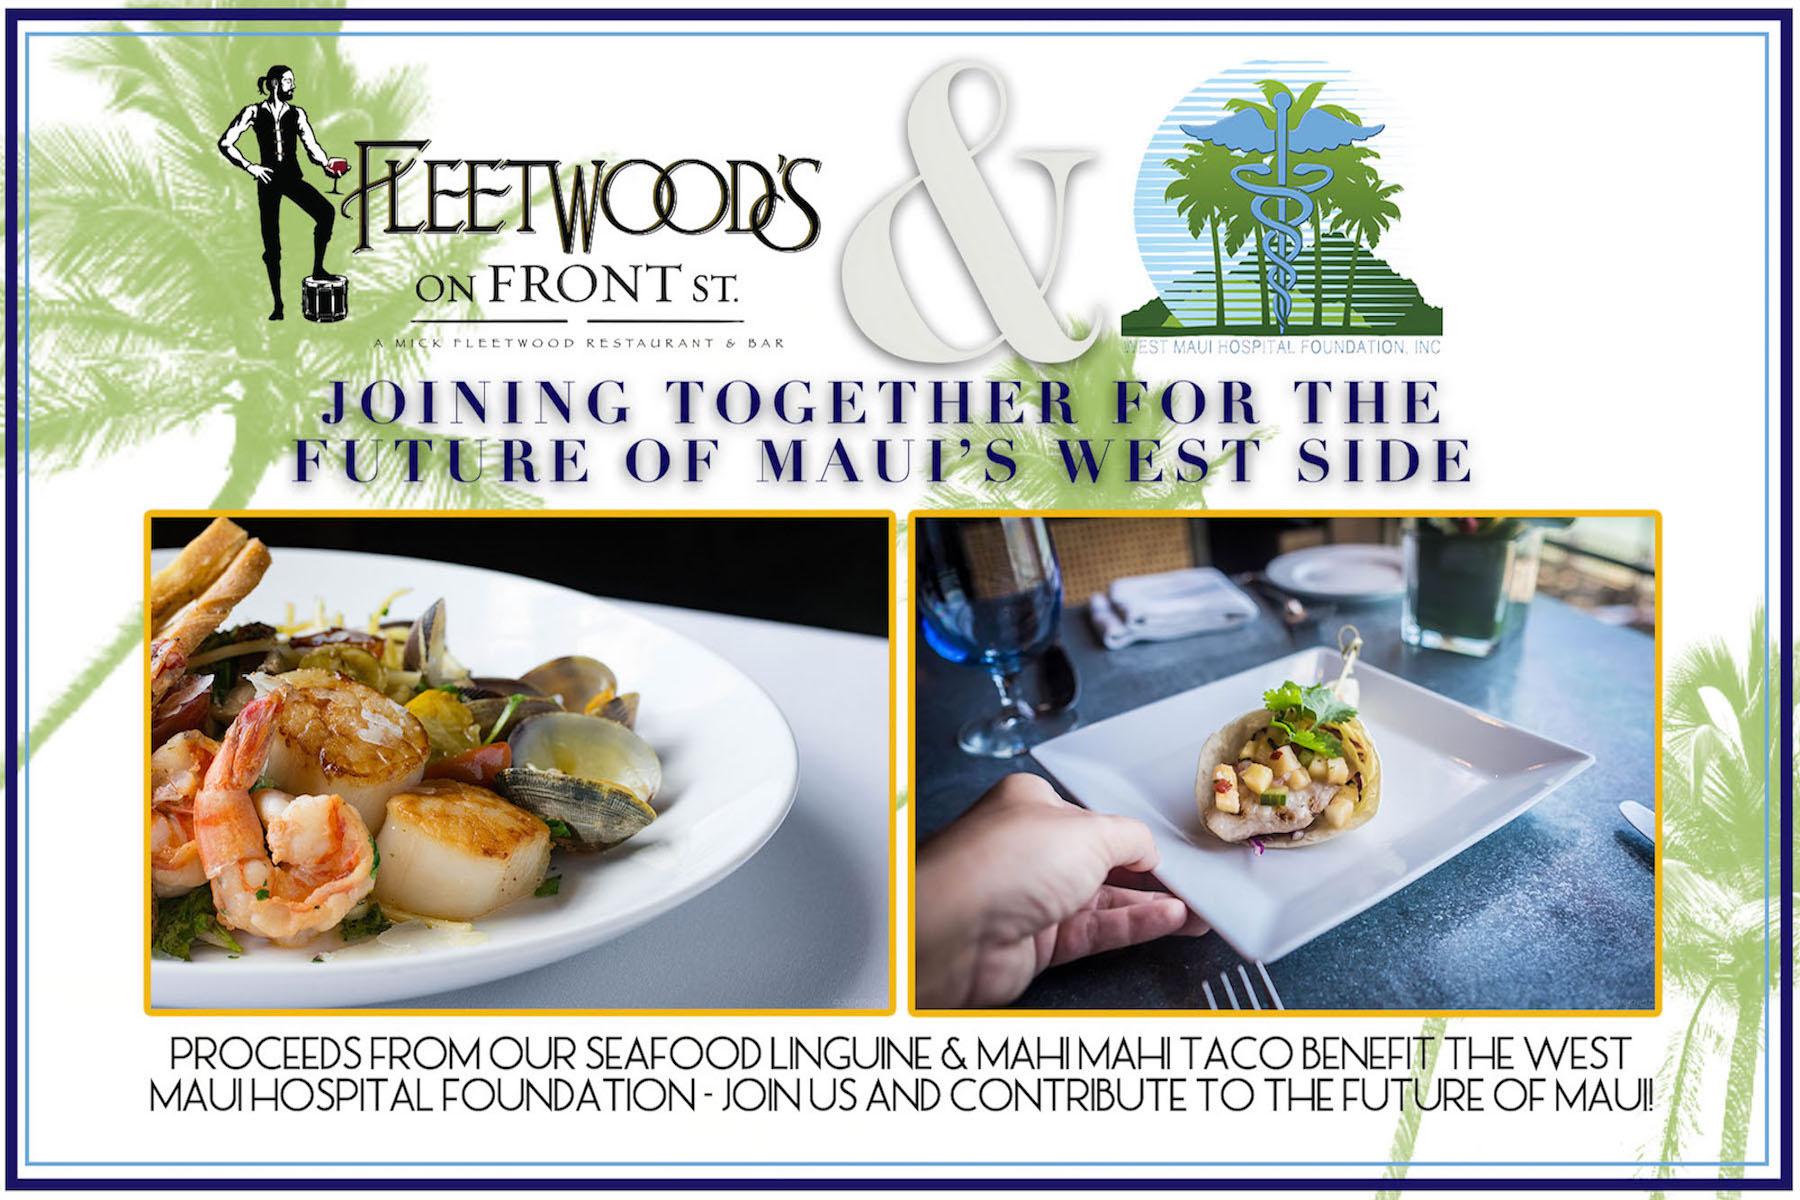 www.fleetwoodsonfrontst.com/